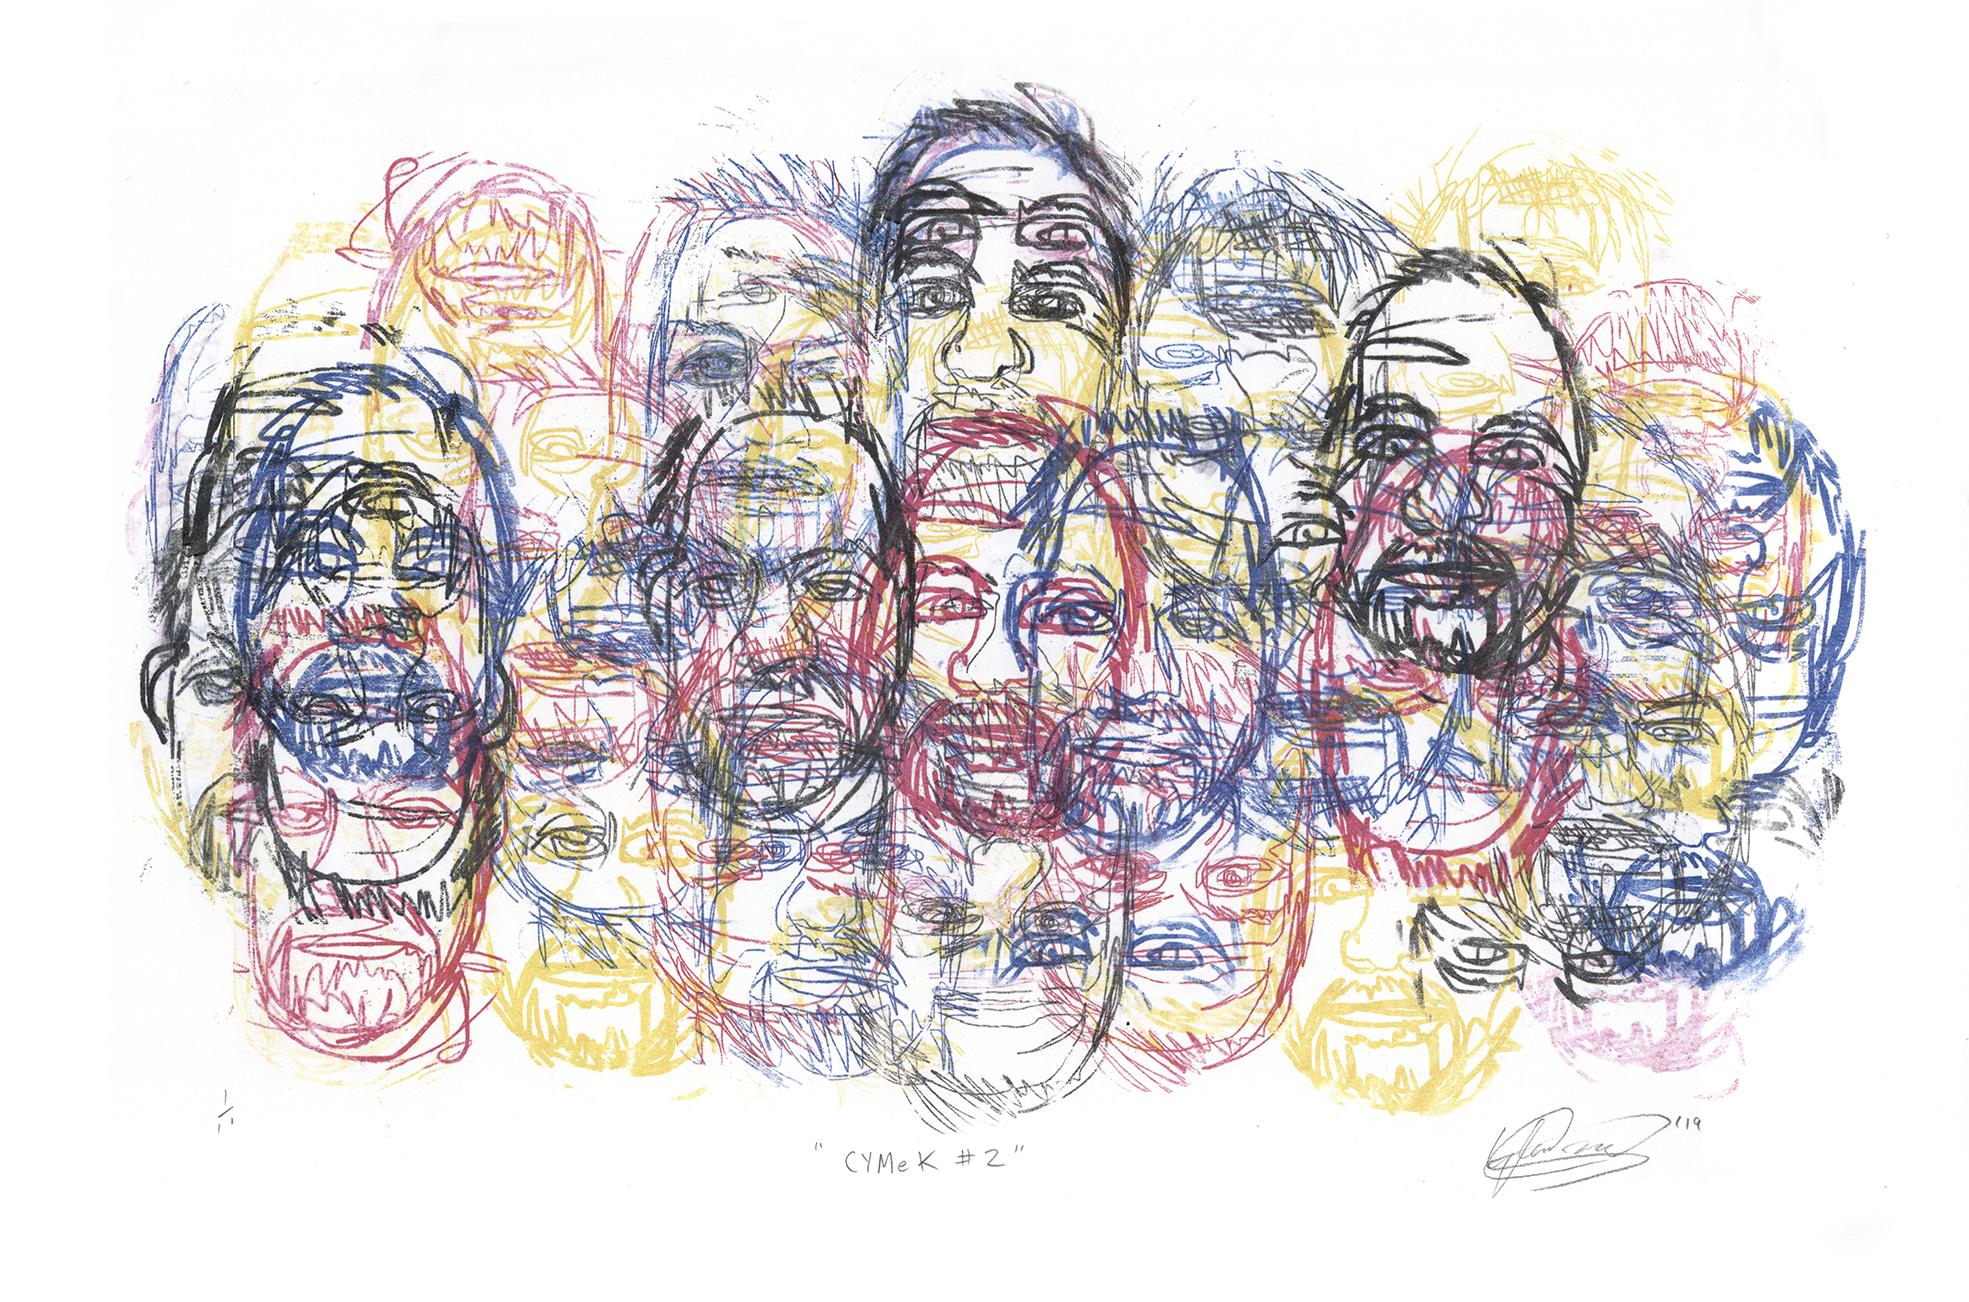 CYMeK # 2. Monoprint on paper. 54cm x 39cm. 2019